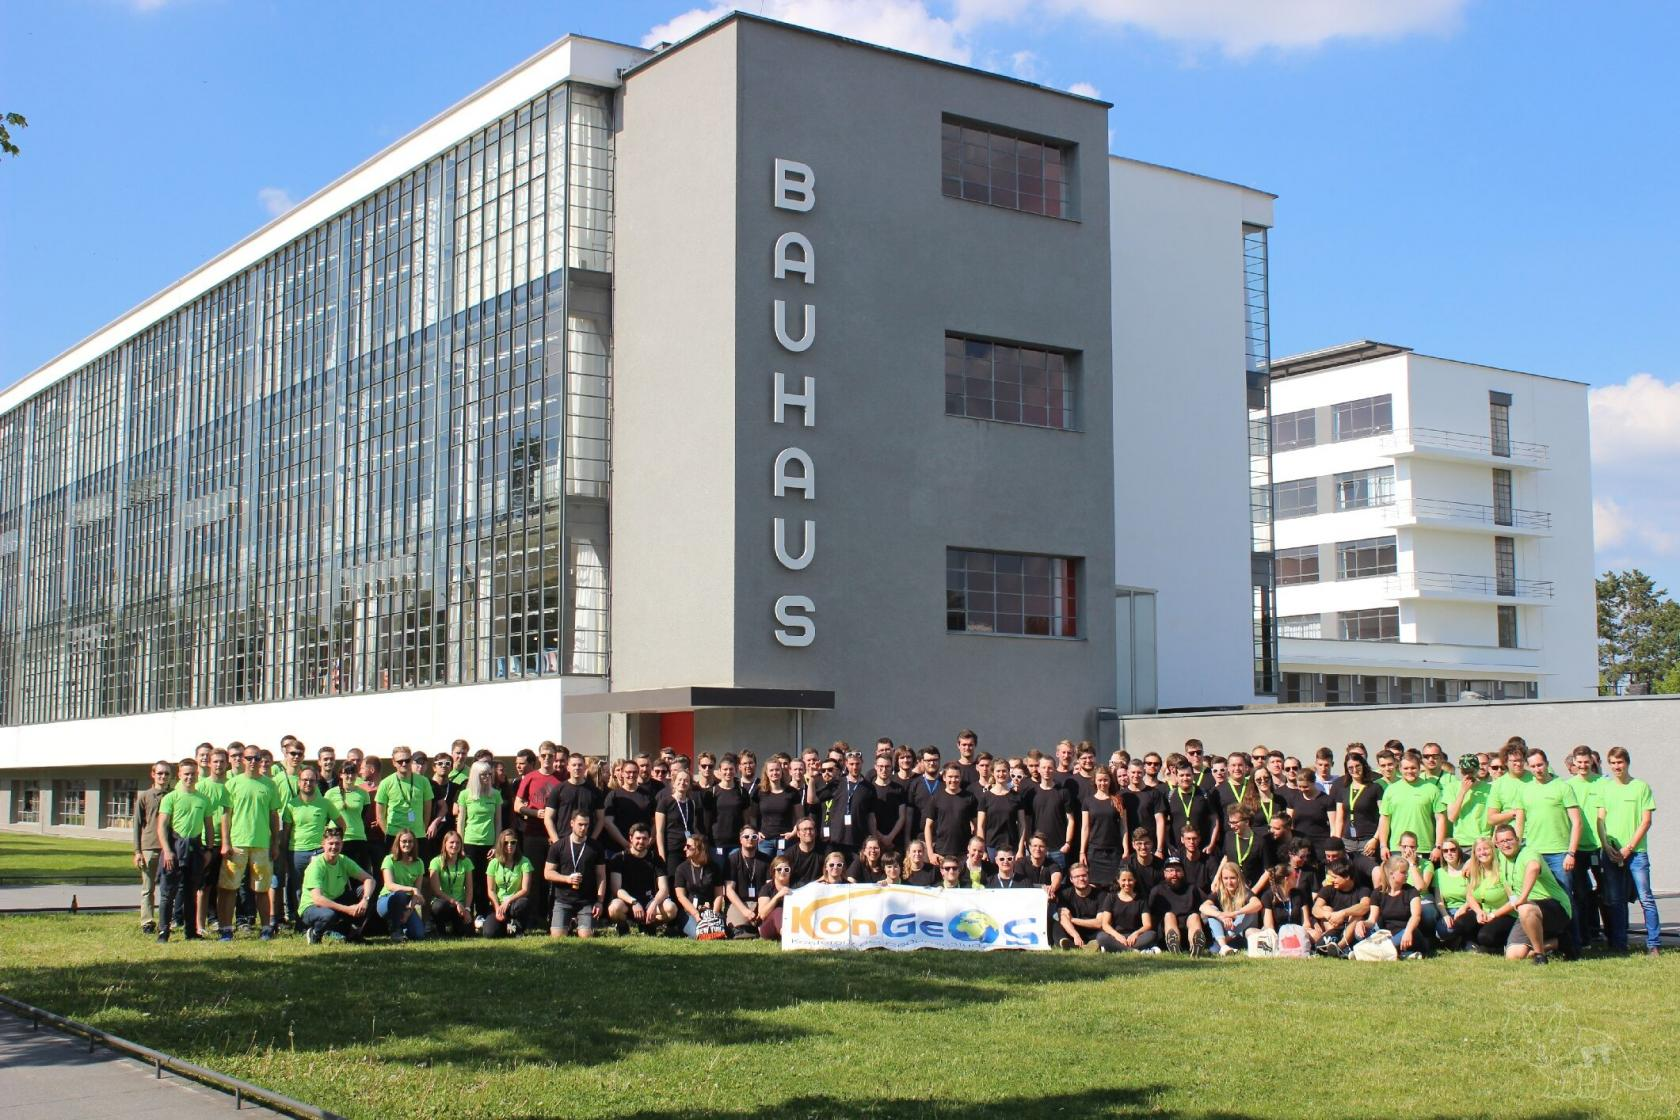 Gruppenfoto KonGeoS 2019 Dessau (Bild: Florian: Thiery)